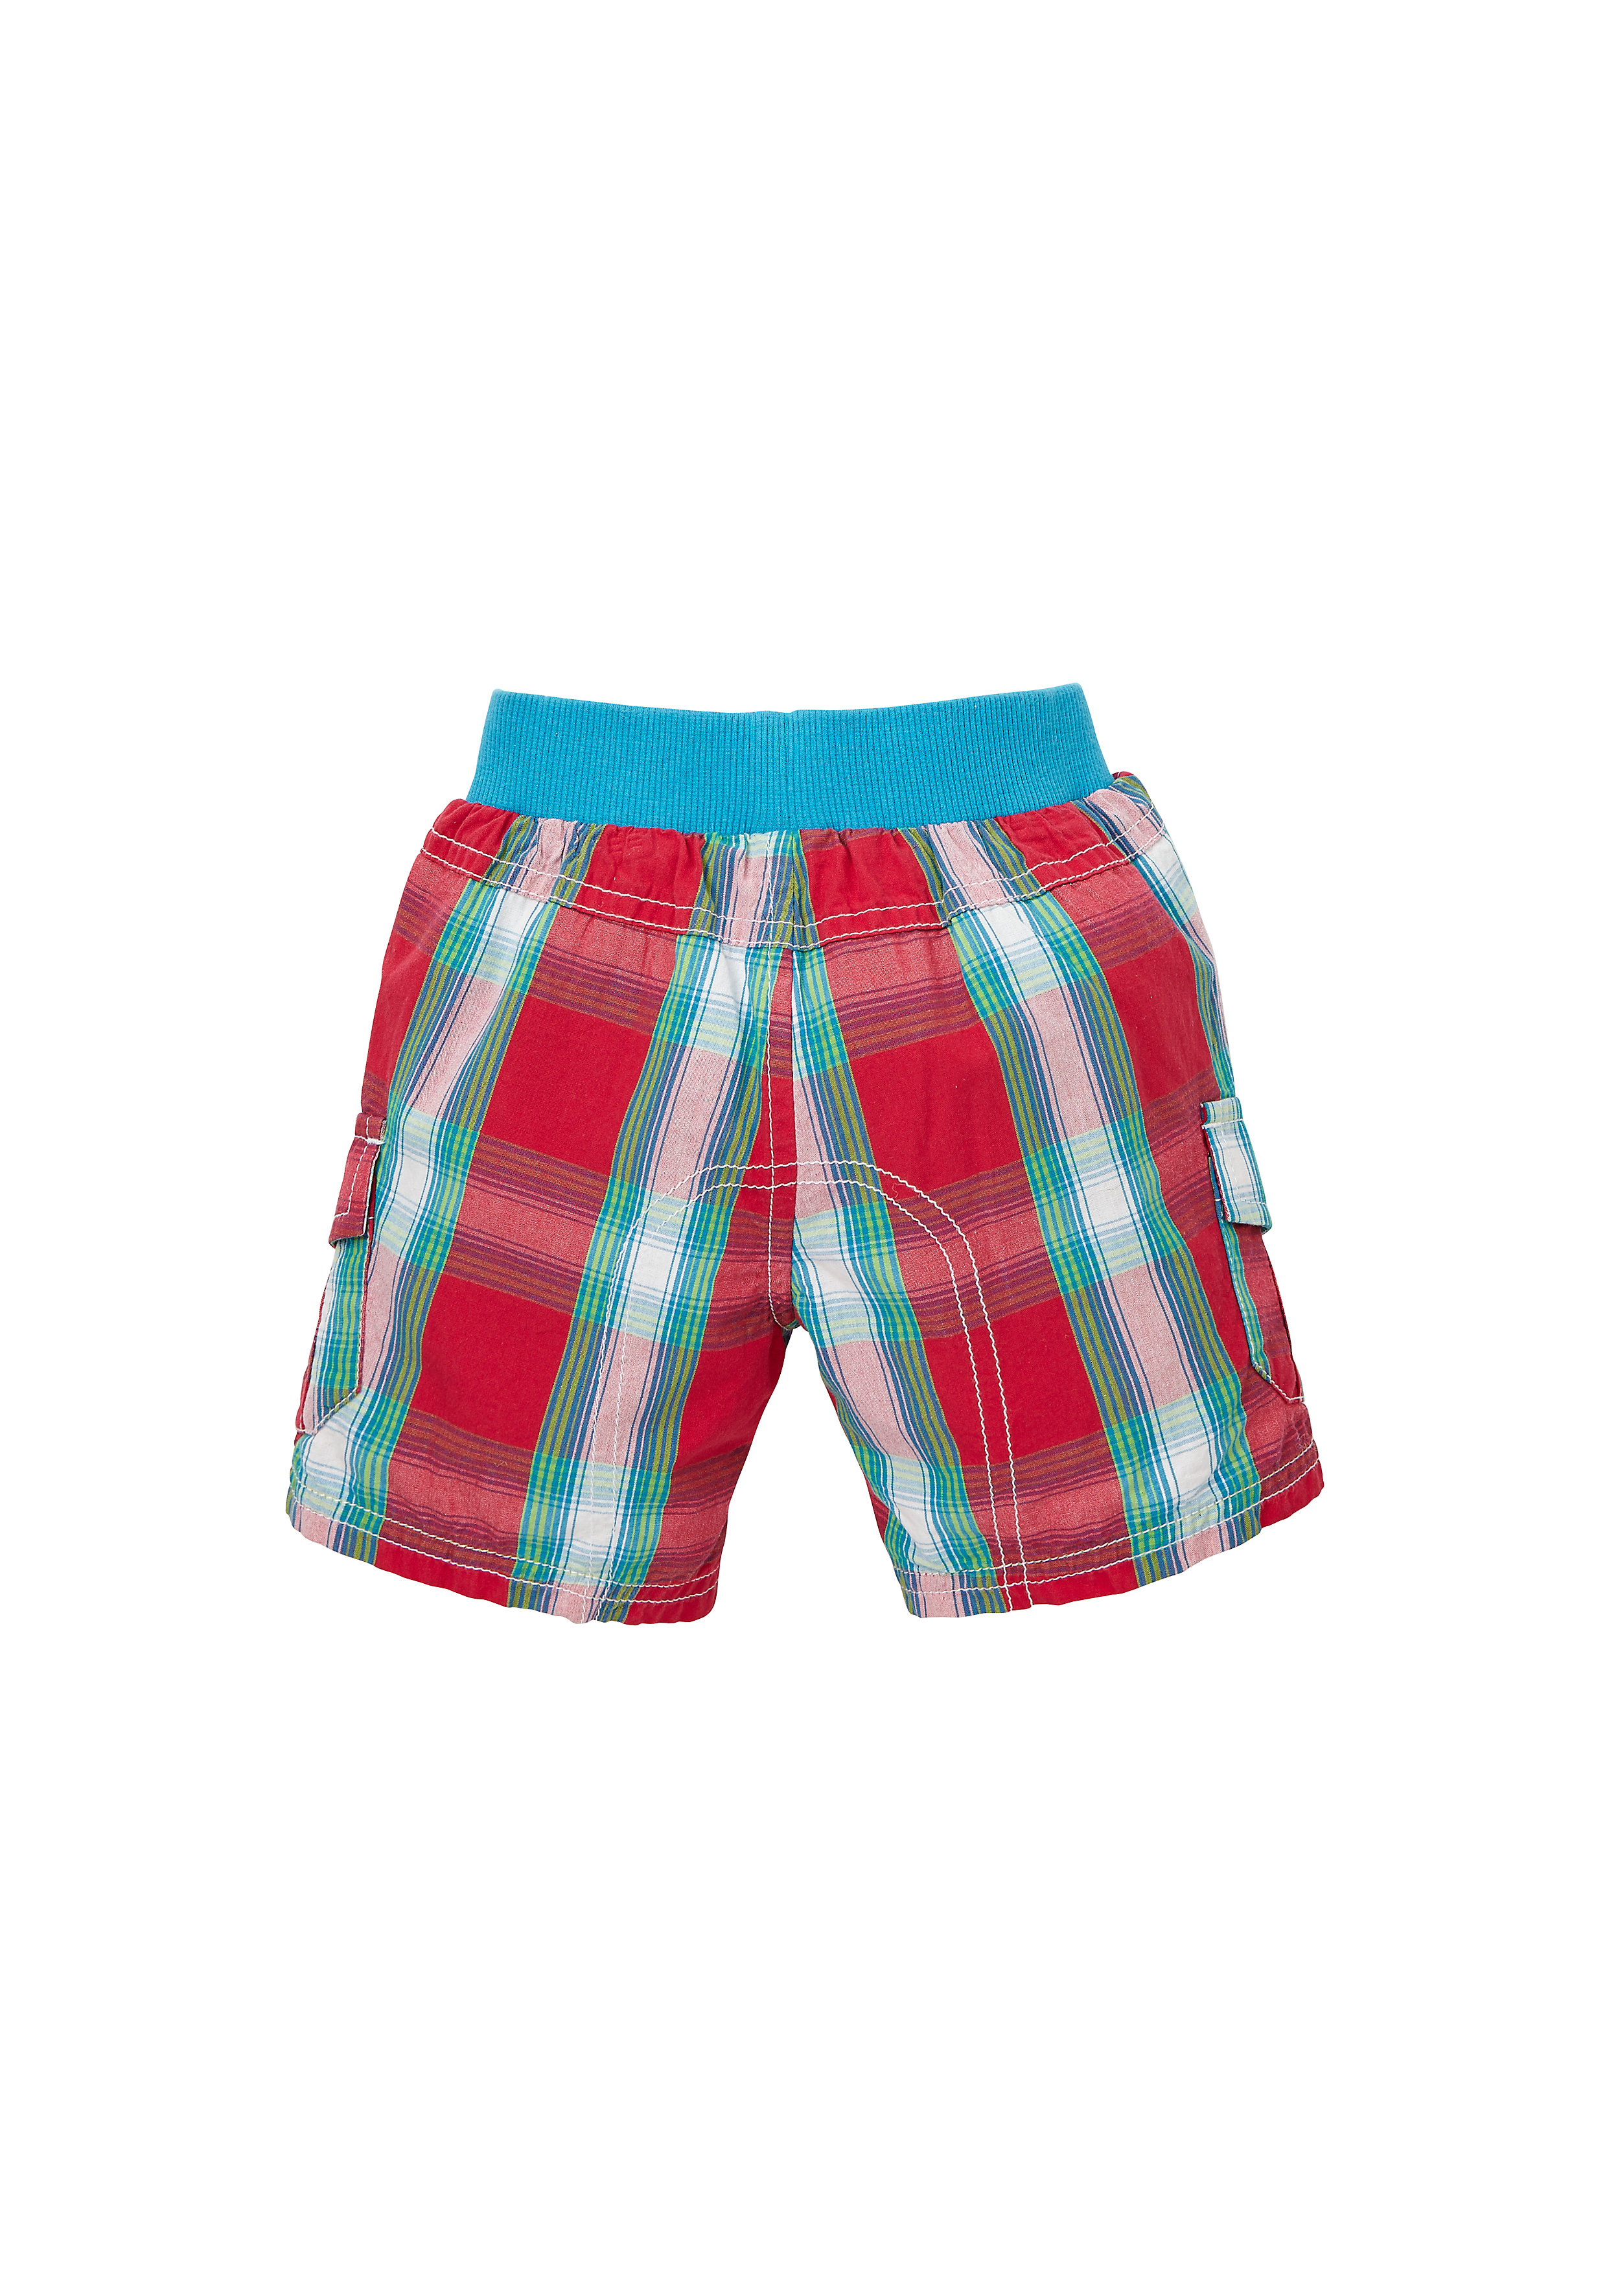 Mothercare | Boys Checked Shorts - Multicolor